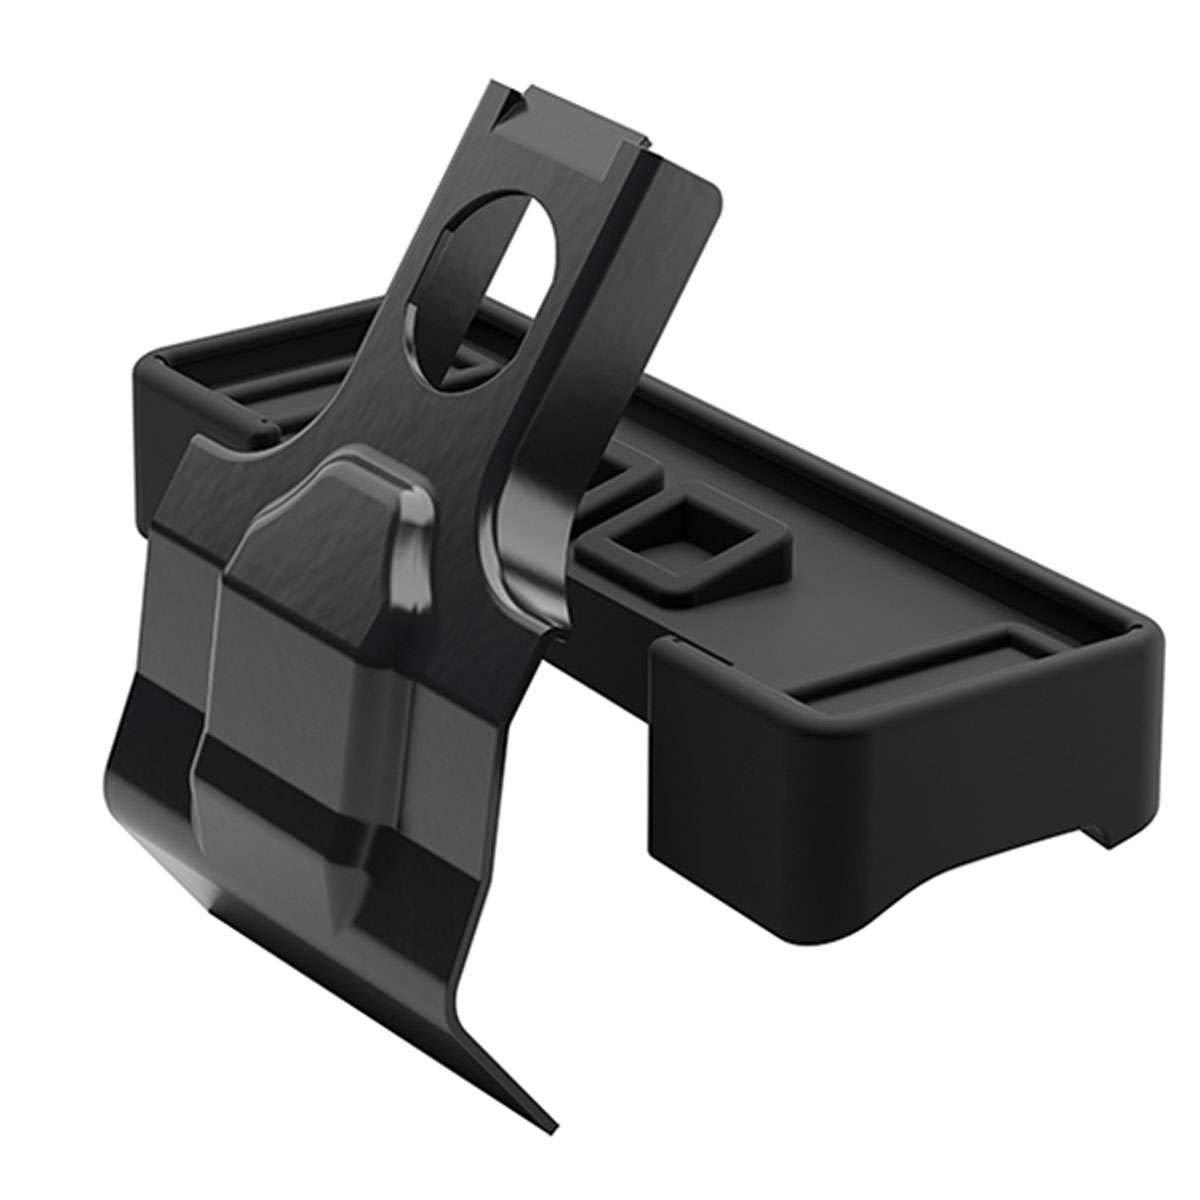 Thule Evo system fit kits